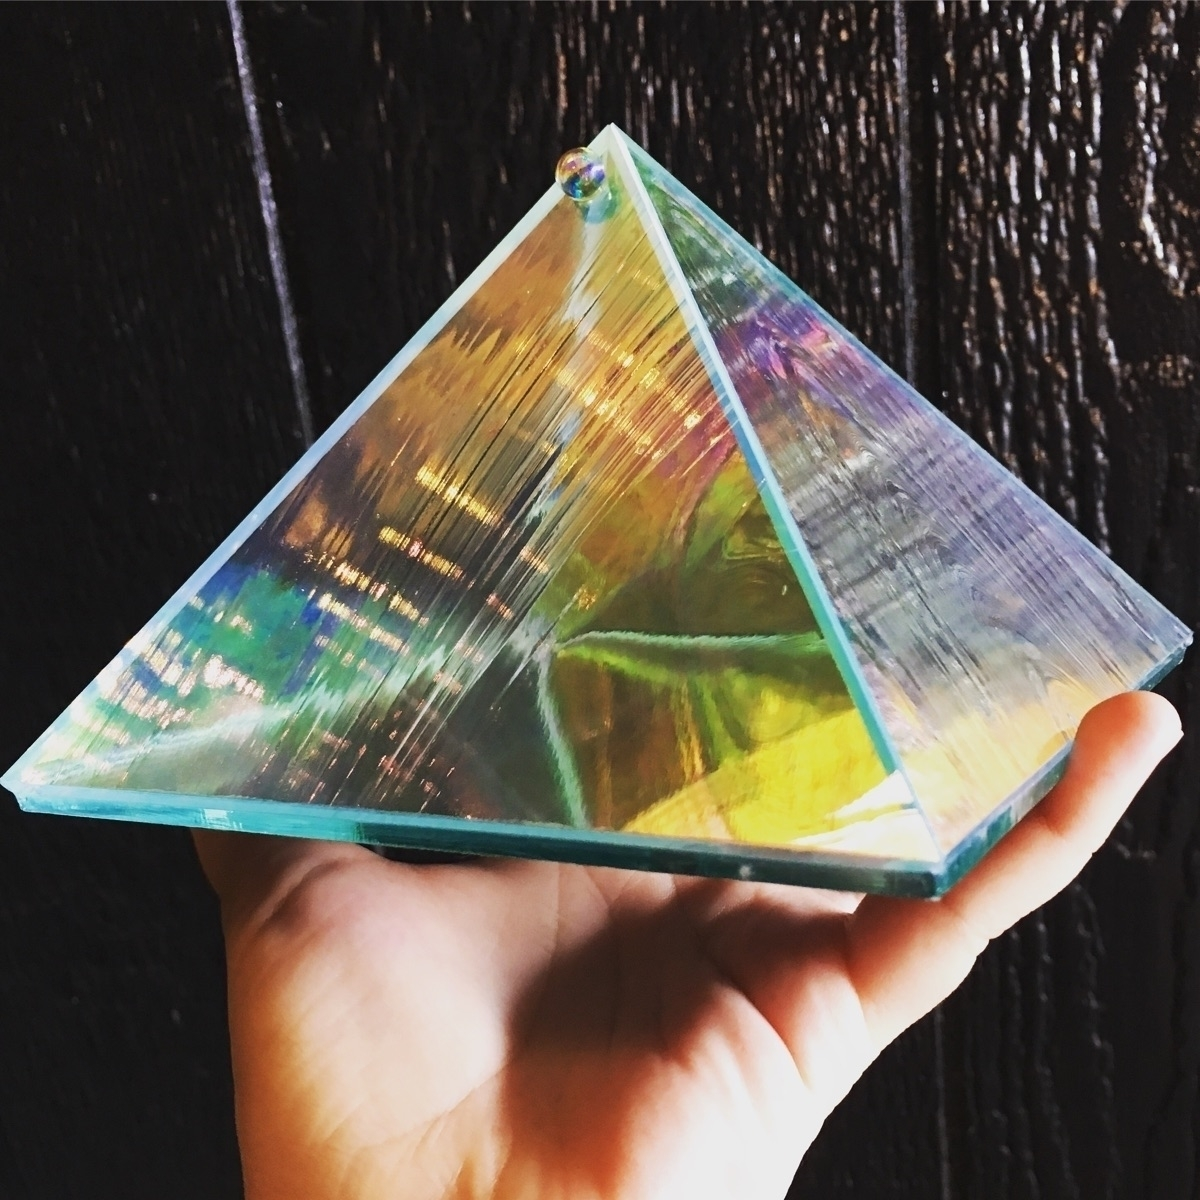 Charging + Intention Pyramid. O - helloviolet | ello